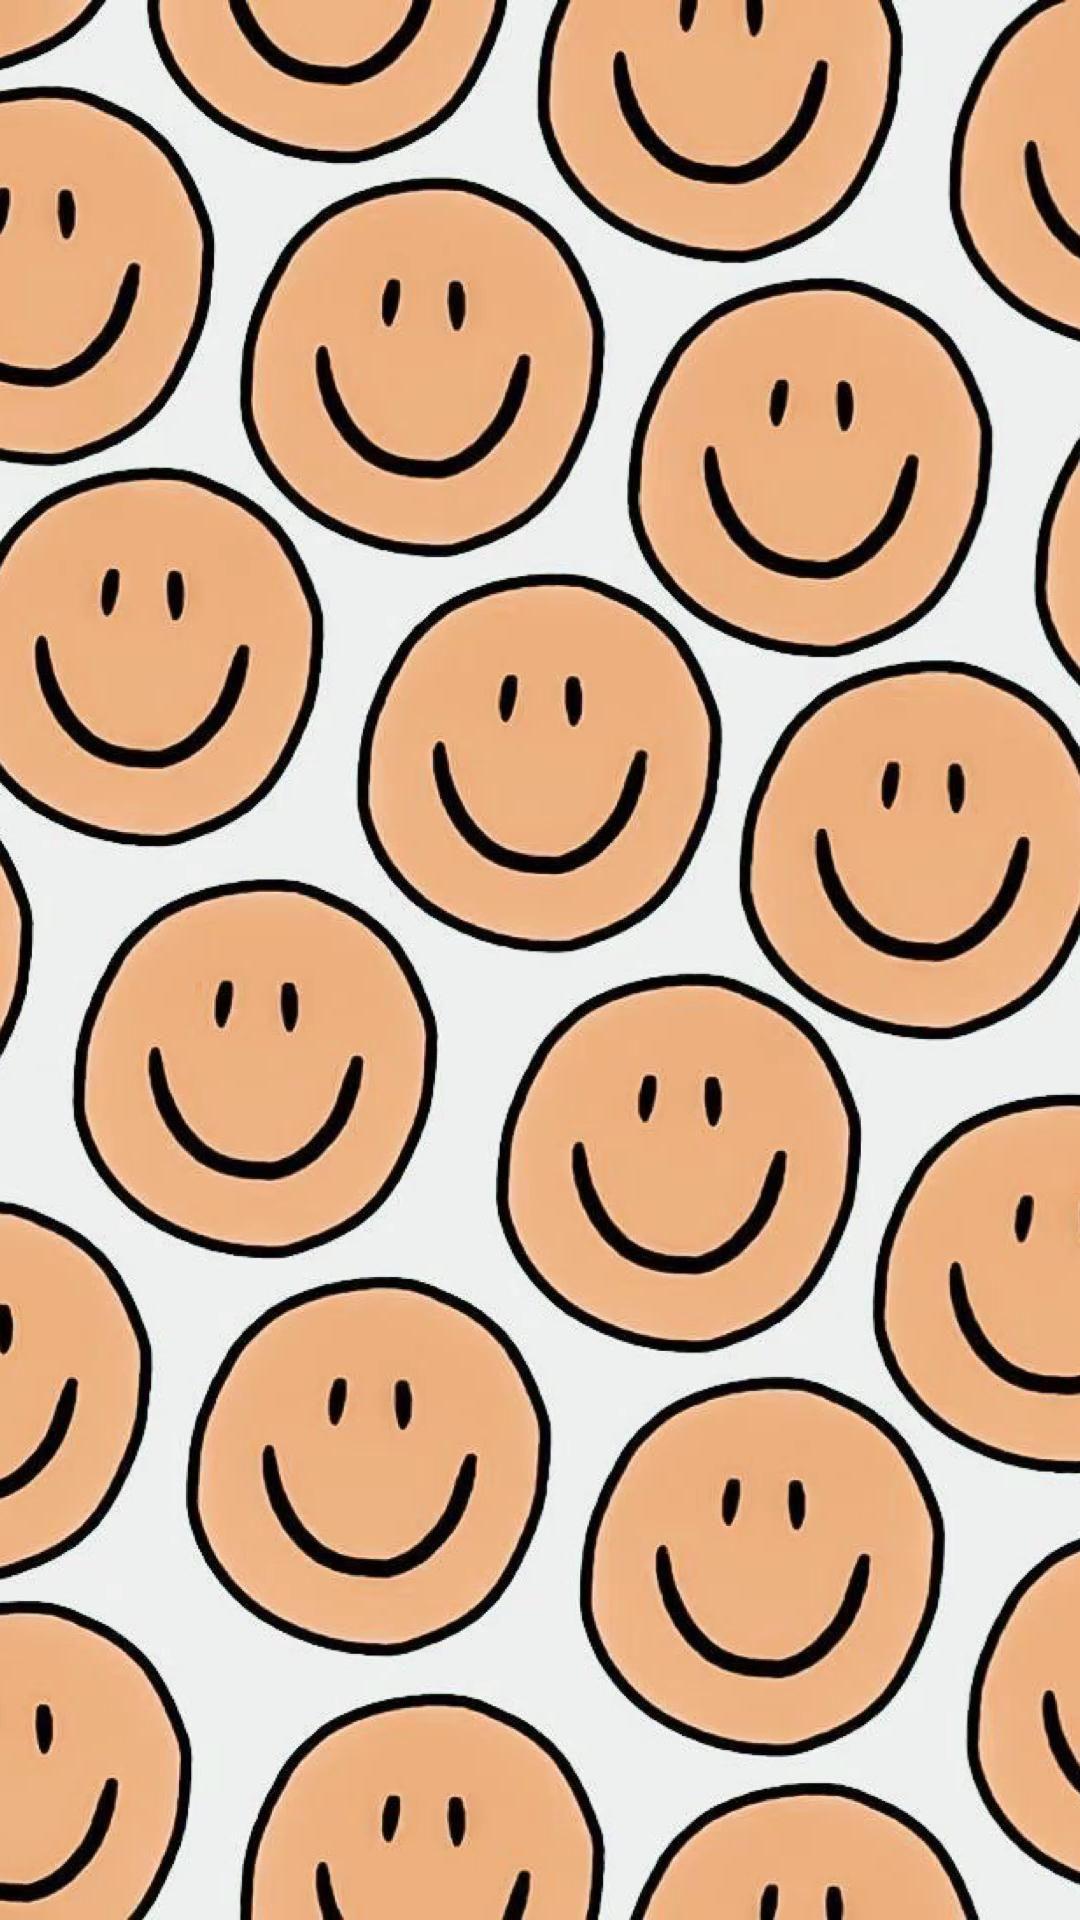 smiley iphone wallpaper / aesthetic wallpaper